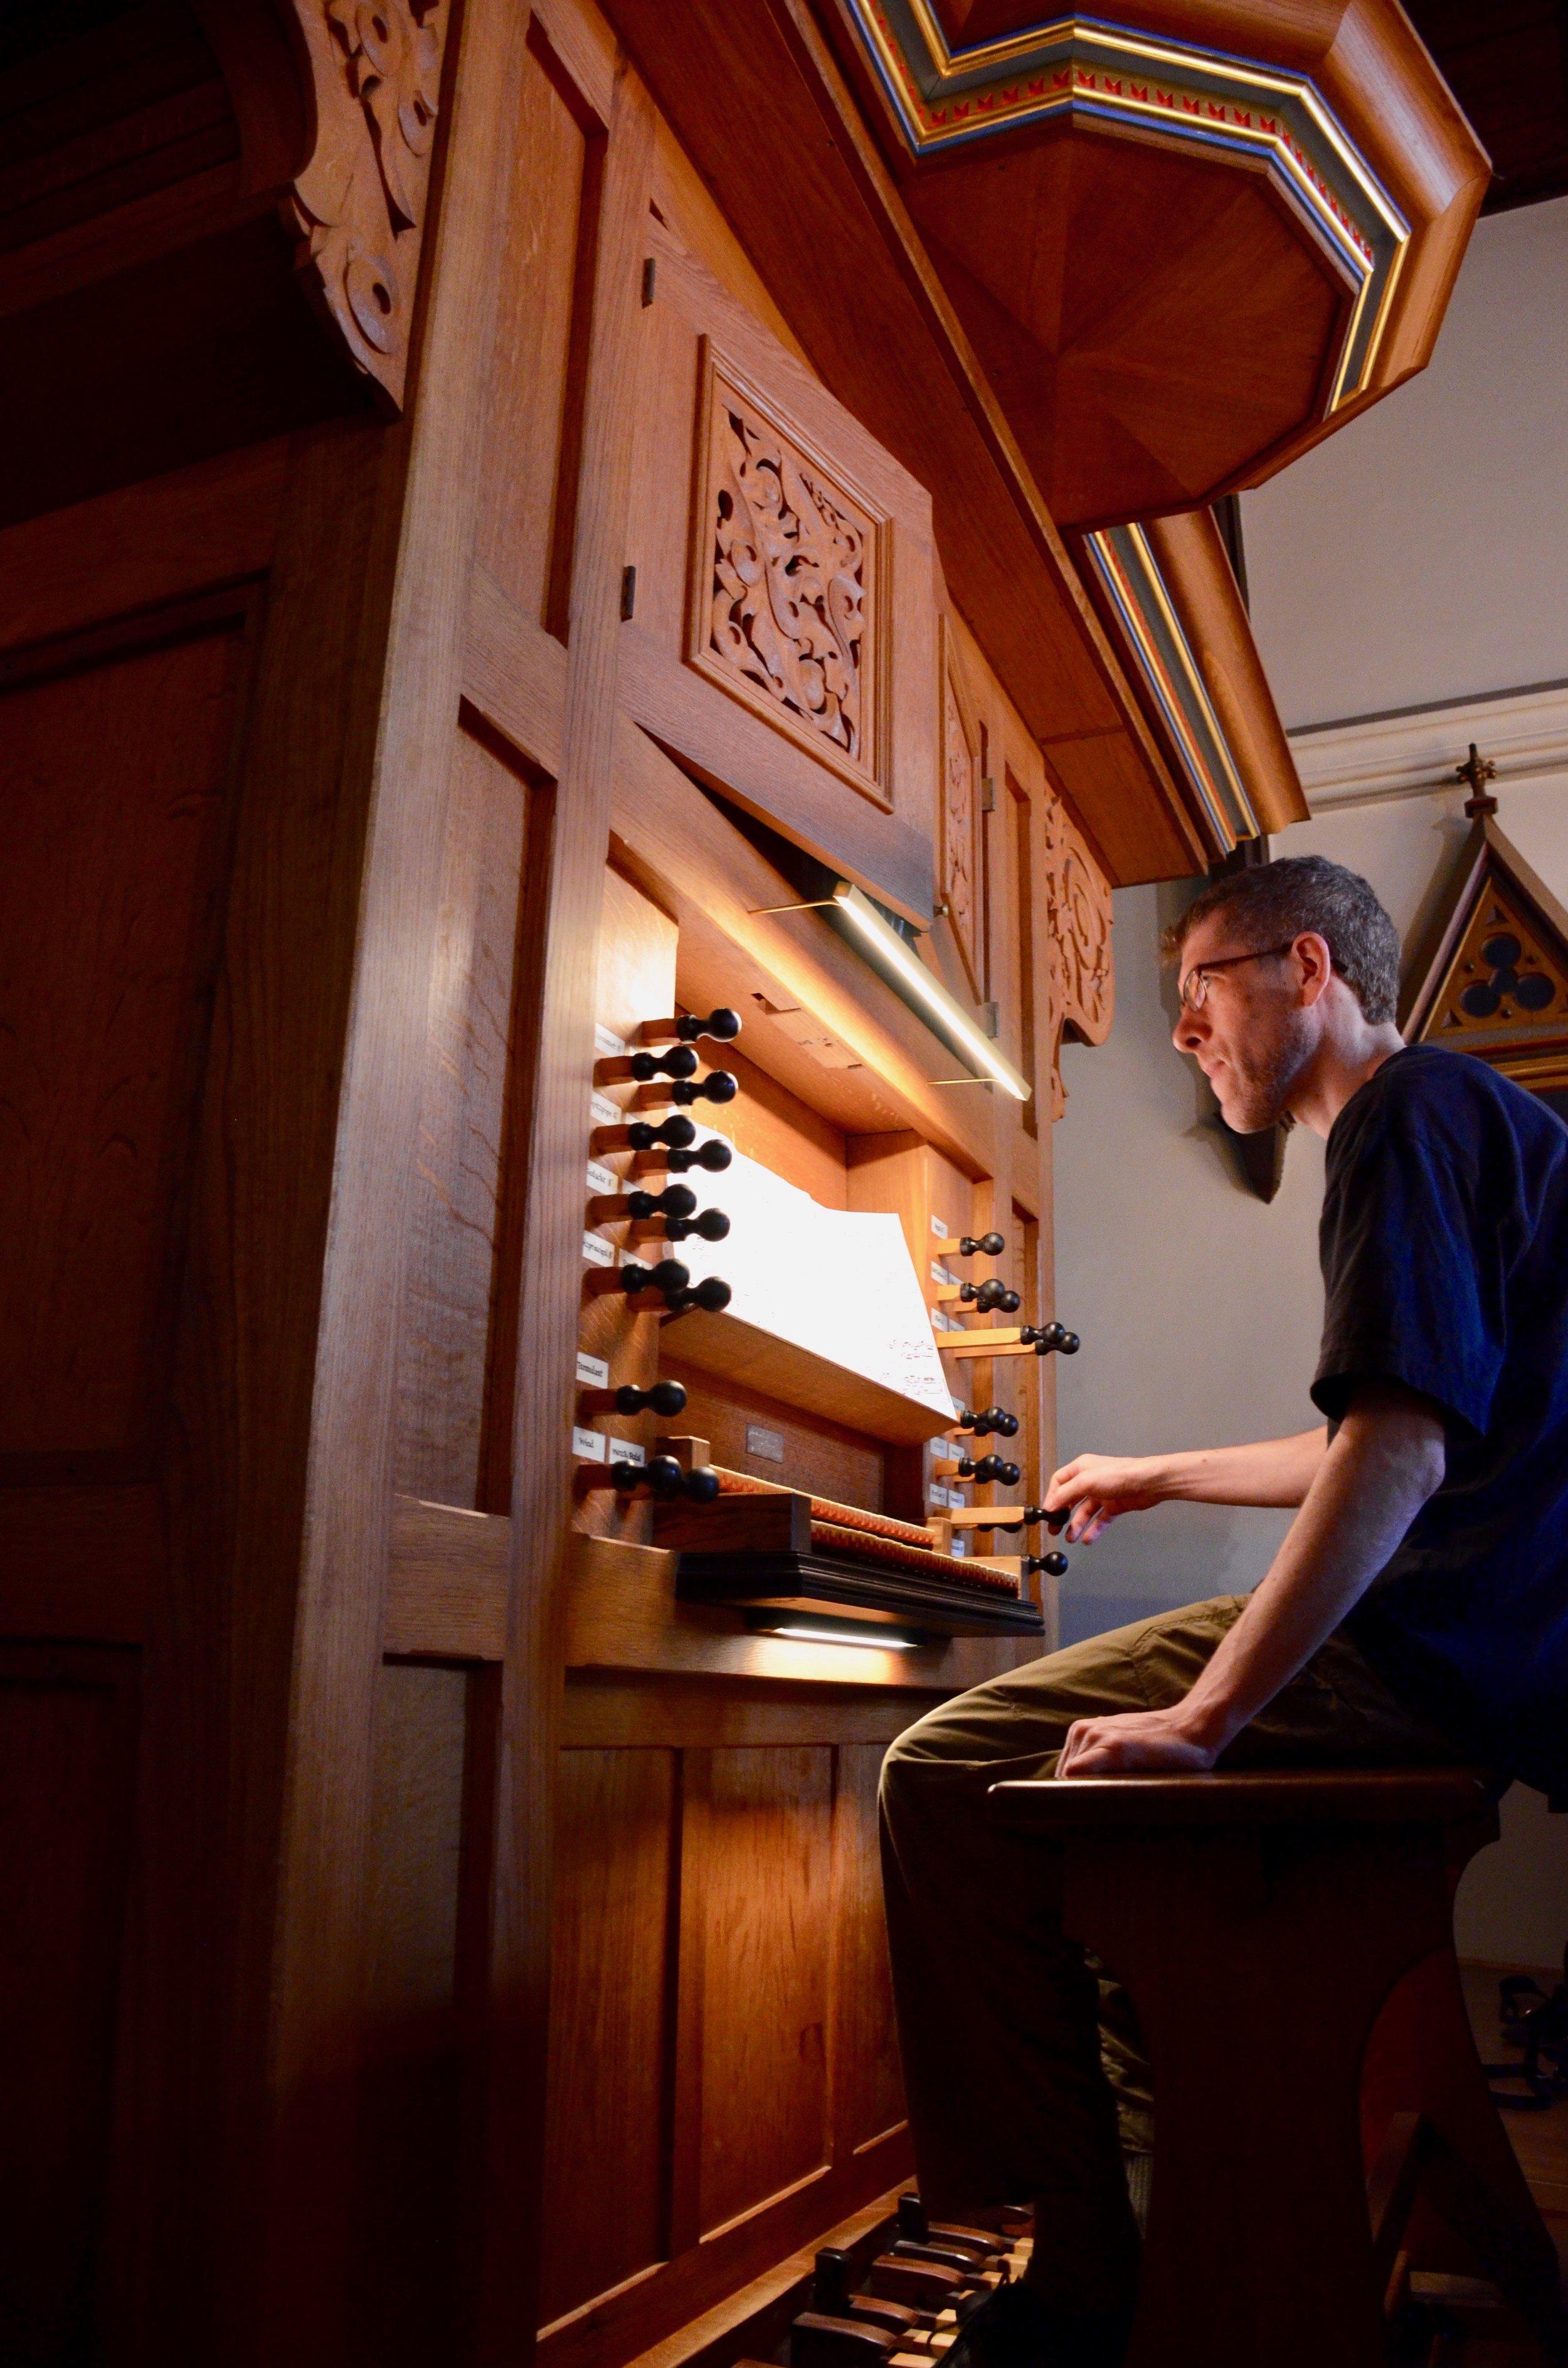 Chris Porter plays the 1992 Brombaugh organ, Haga Church, Göteborg, Sweden.